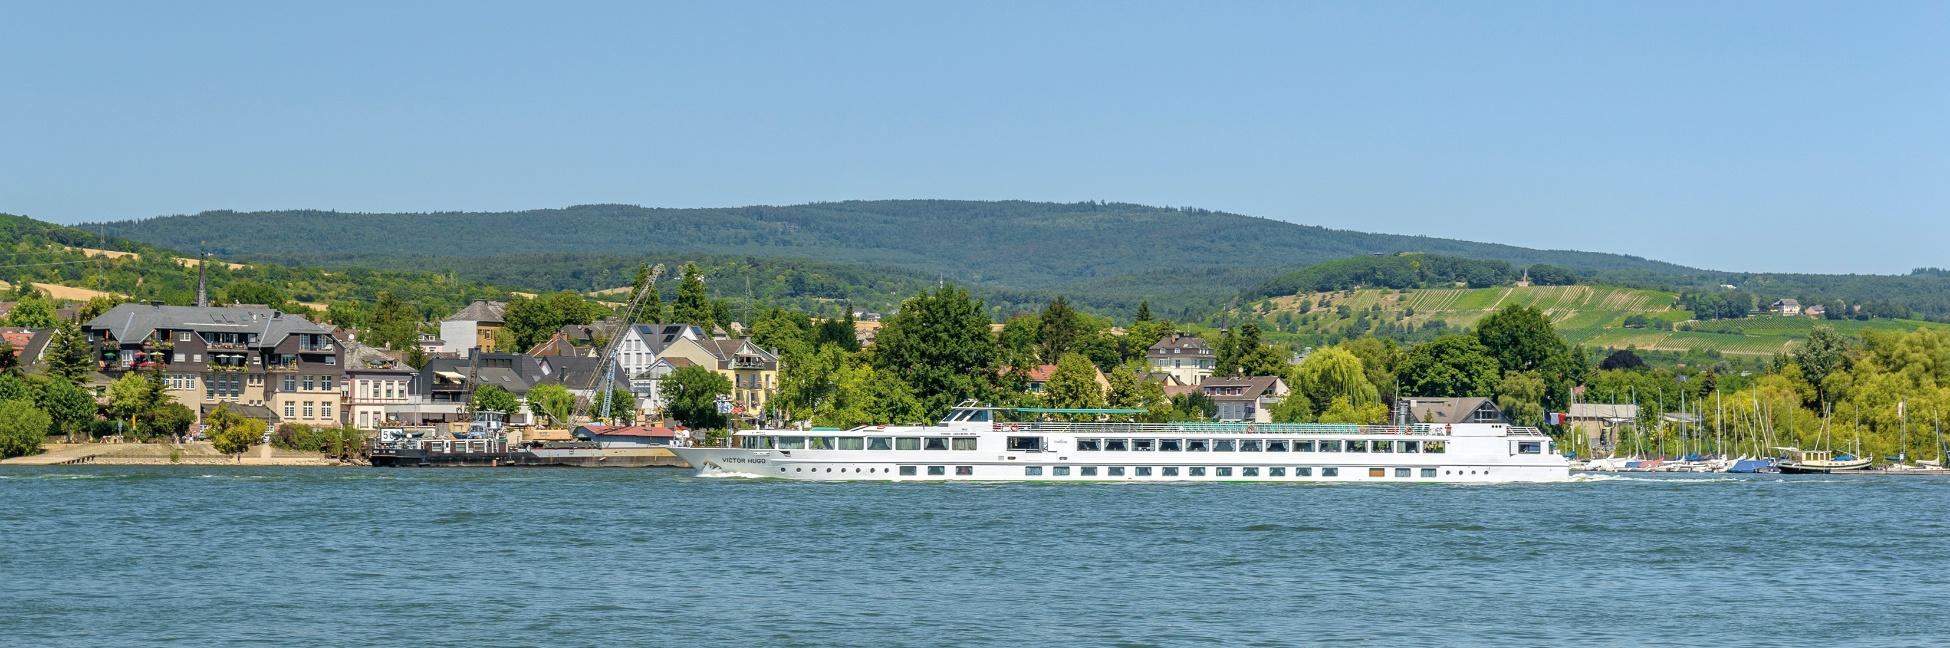 Le MS Victor Hugo sur le Rhin et le Danube